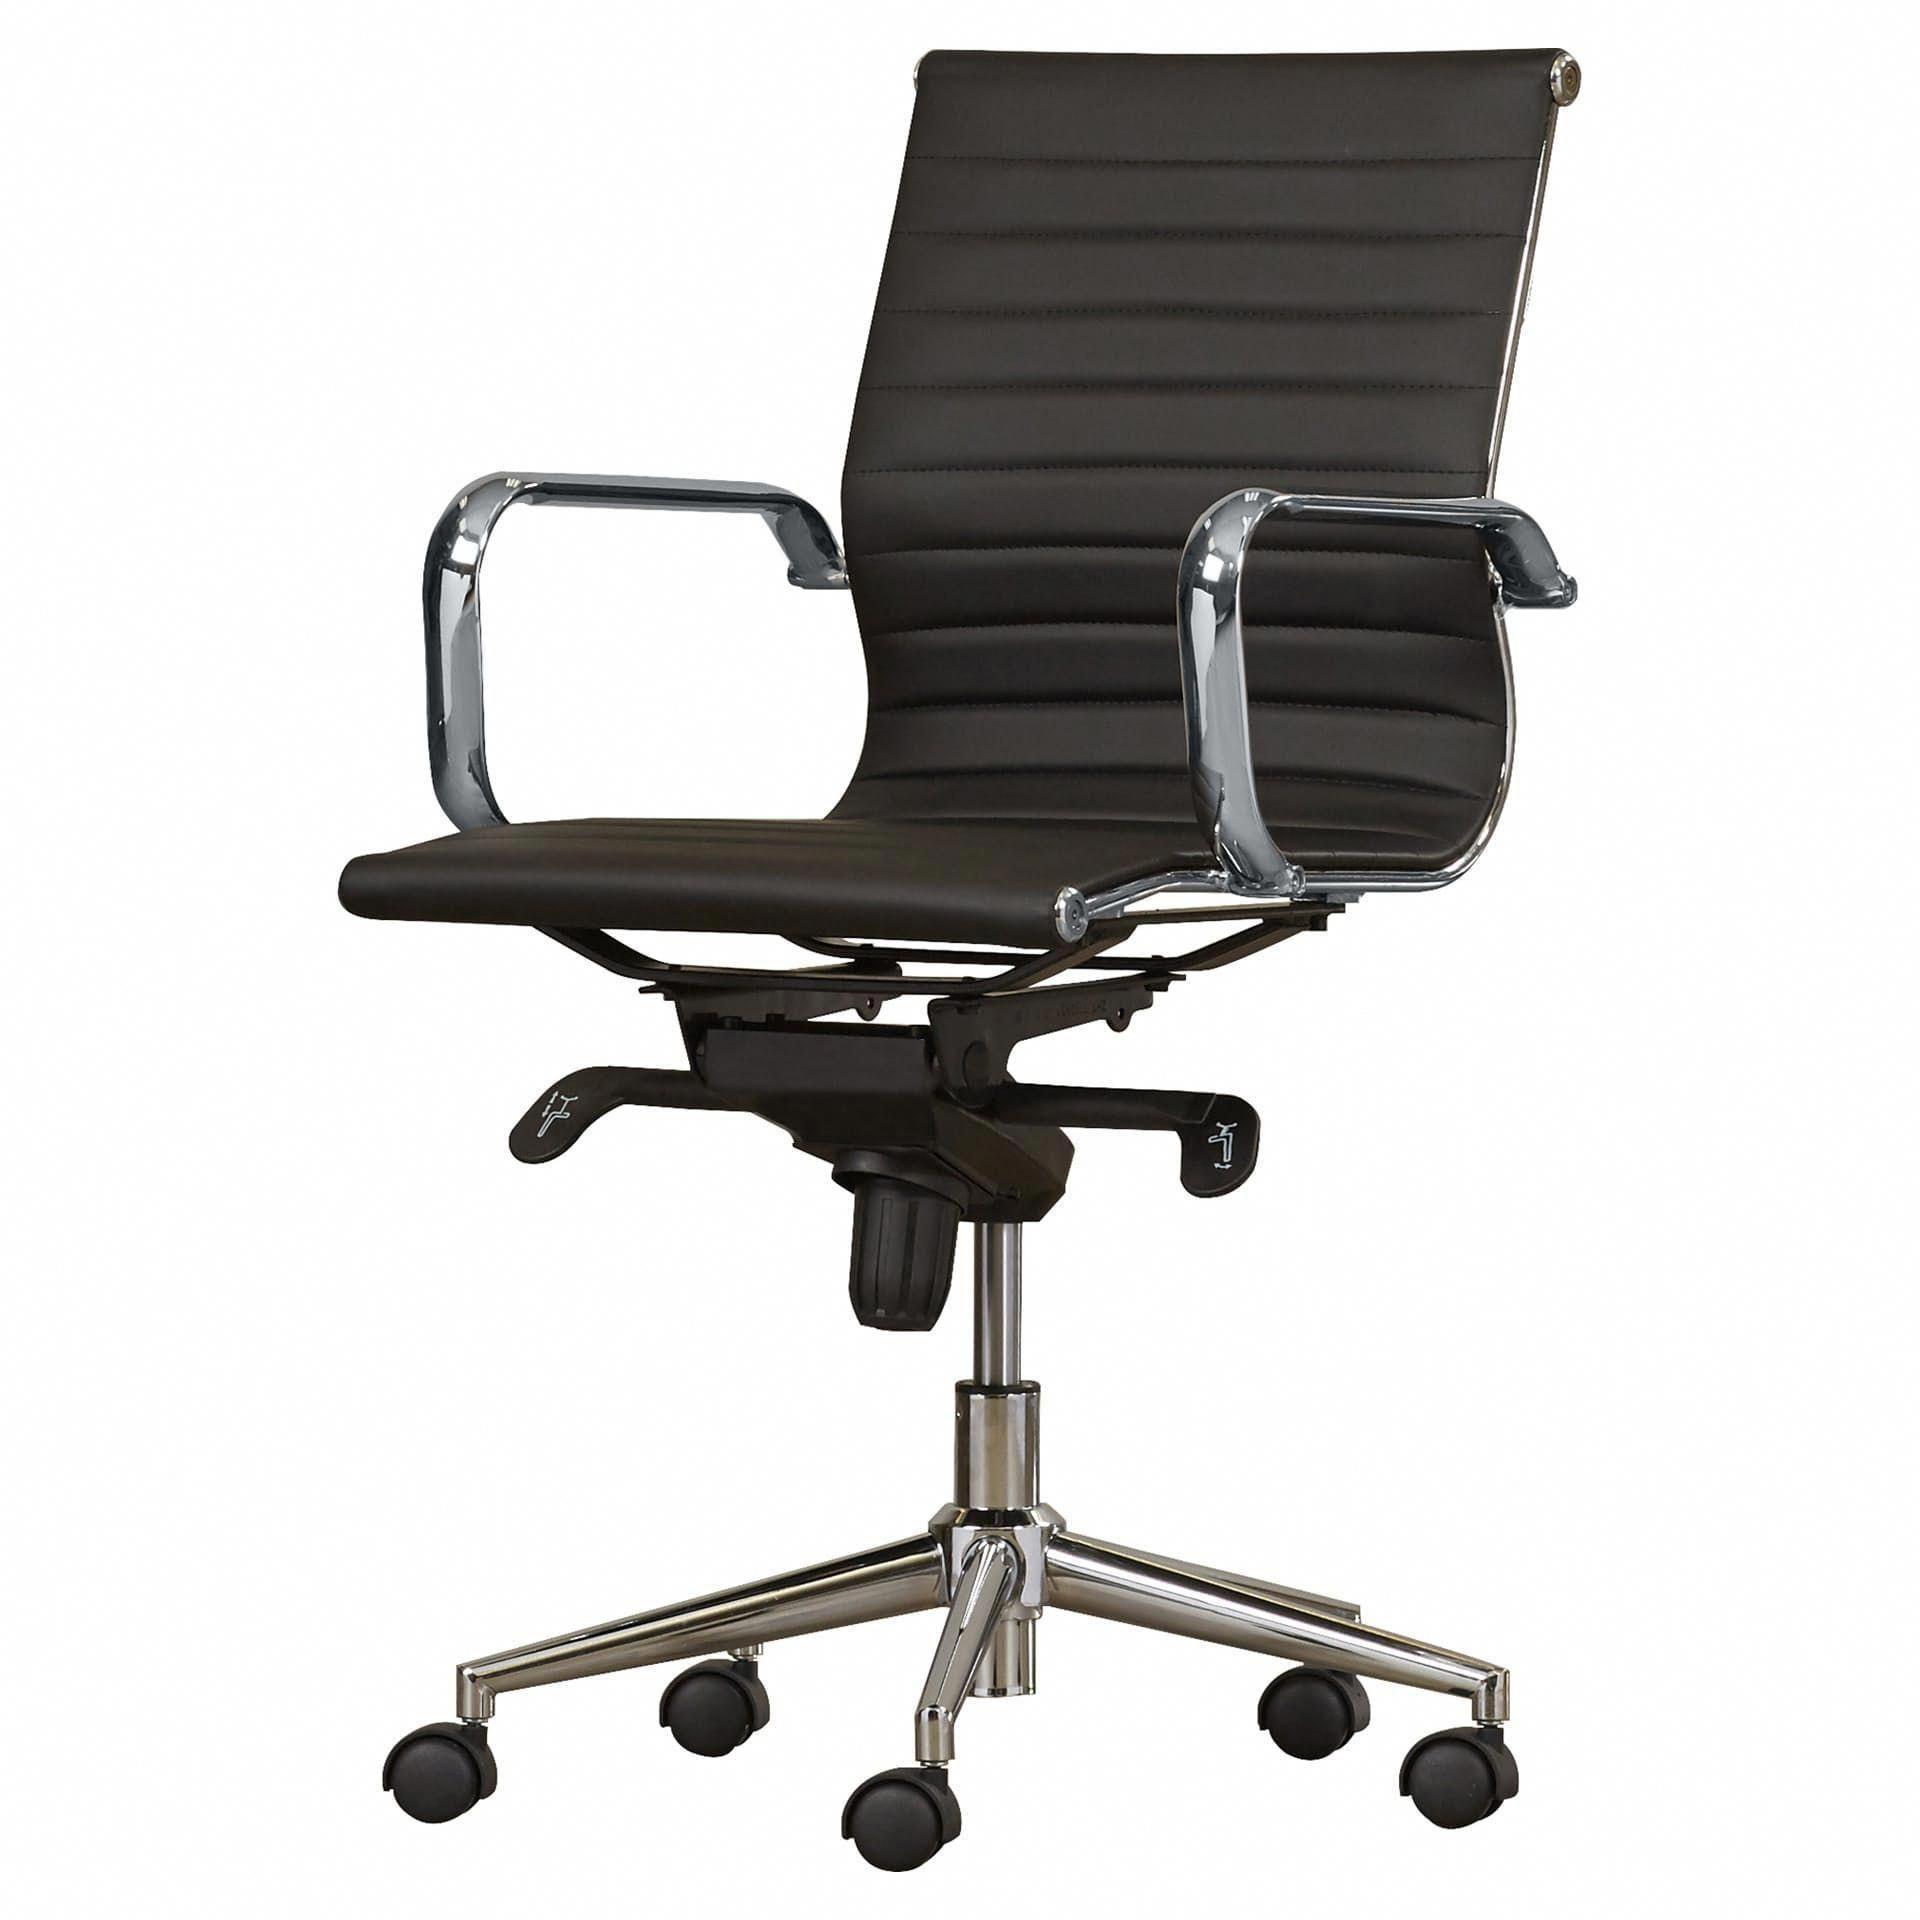 10 Surprisingly Stylish Ergonomic Office Chairs Annual Guide 2017 Ergonomicofficechairstylish Ergonomicofficechairfurniture Adirondackchairkits